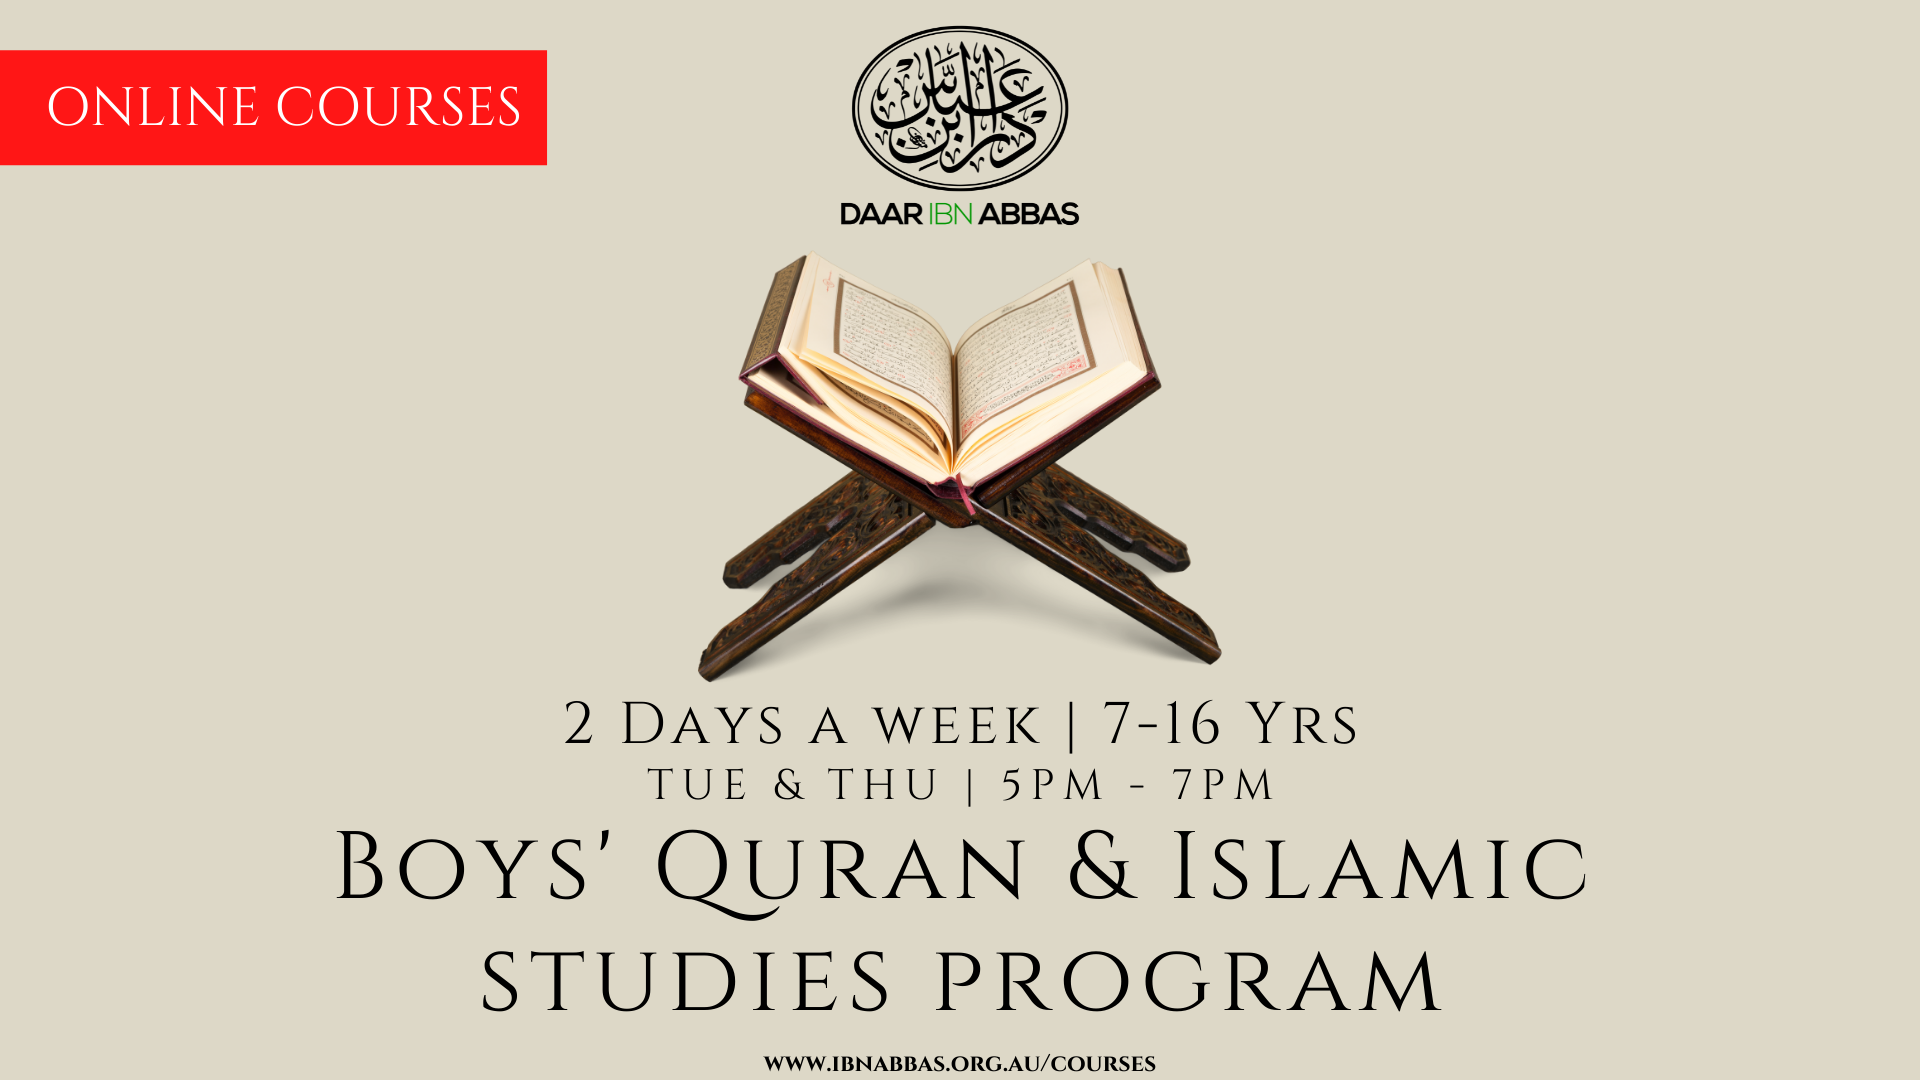 2 Days a Week Boys Quran and Islamic Studies Progr...